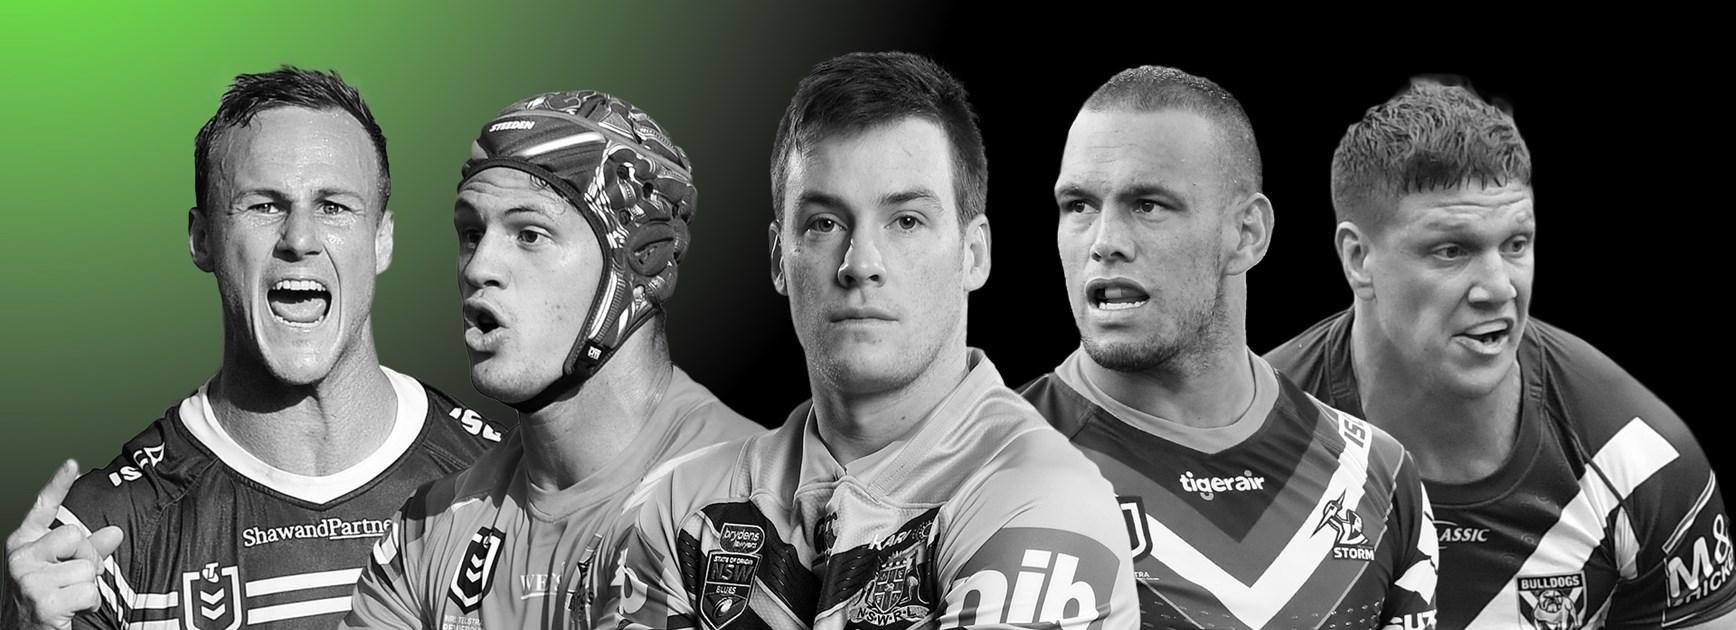 NRL Players' Poll: Part 2 - Hardest hitter, best sledger and transfer window